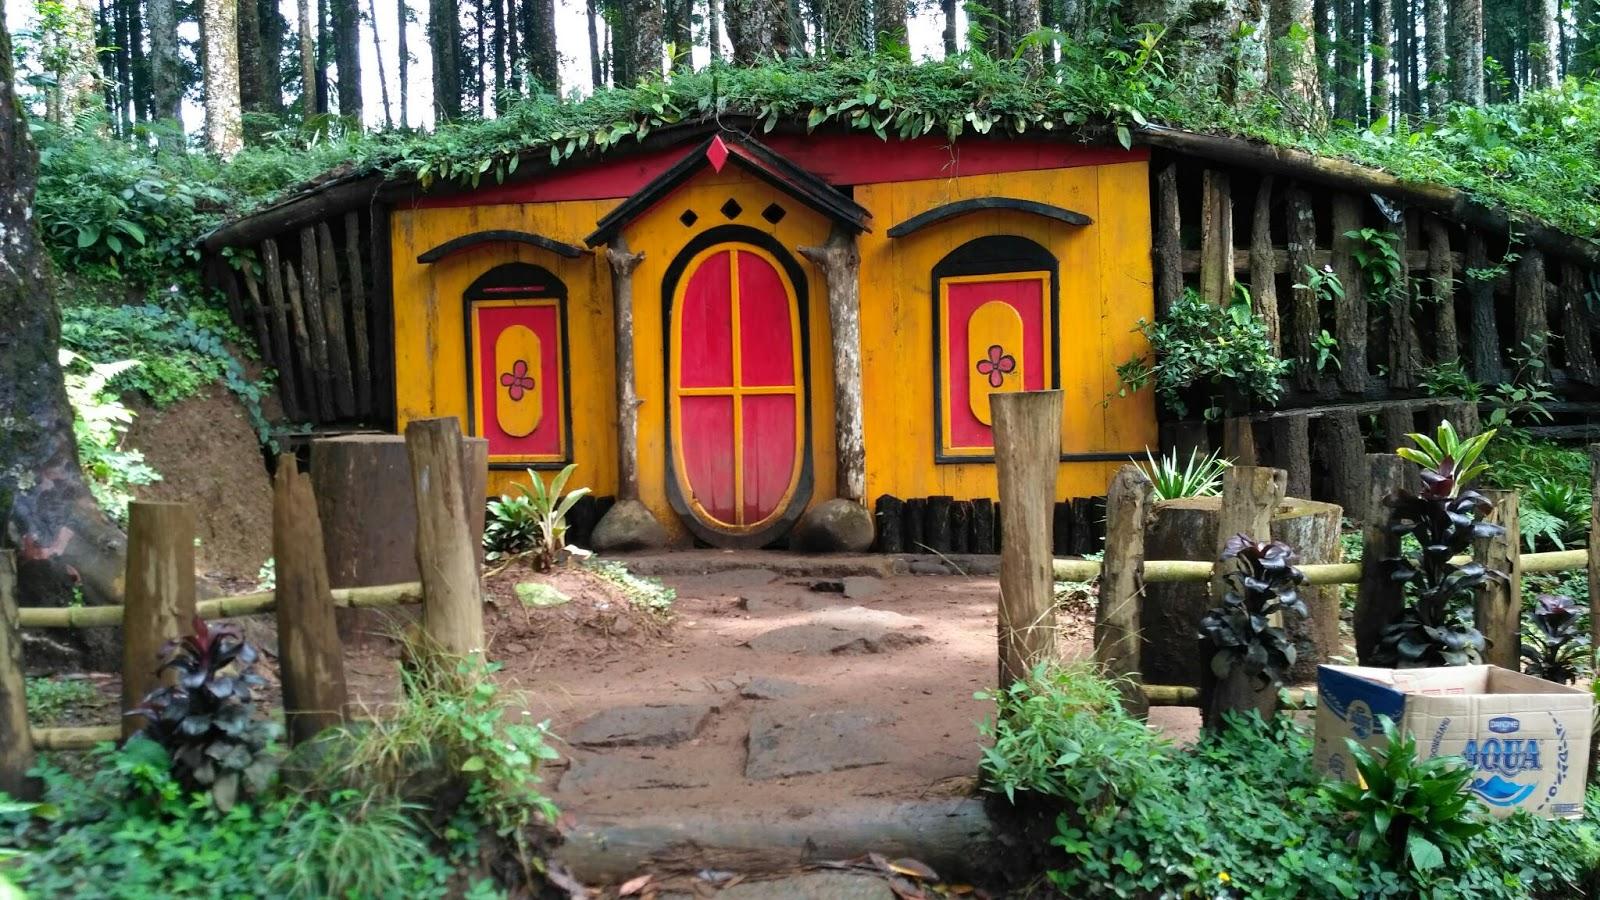 27 Wisata Purbalingga Populer Liburan Tempat Lokasi Kampung Kurcaci Serang